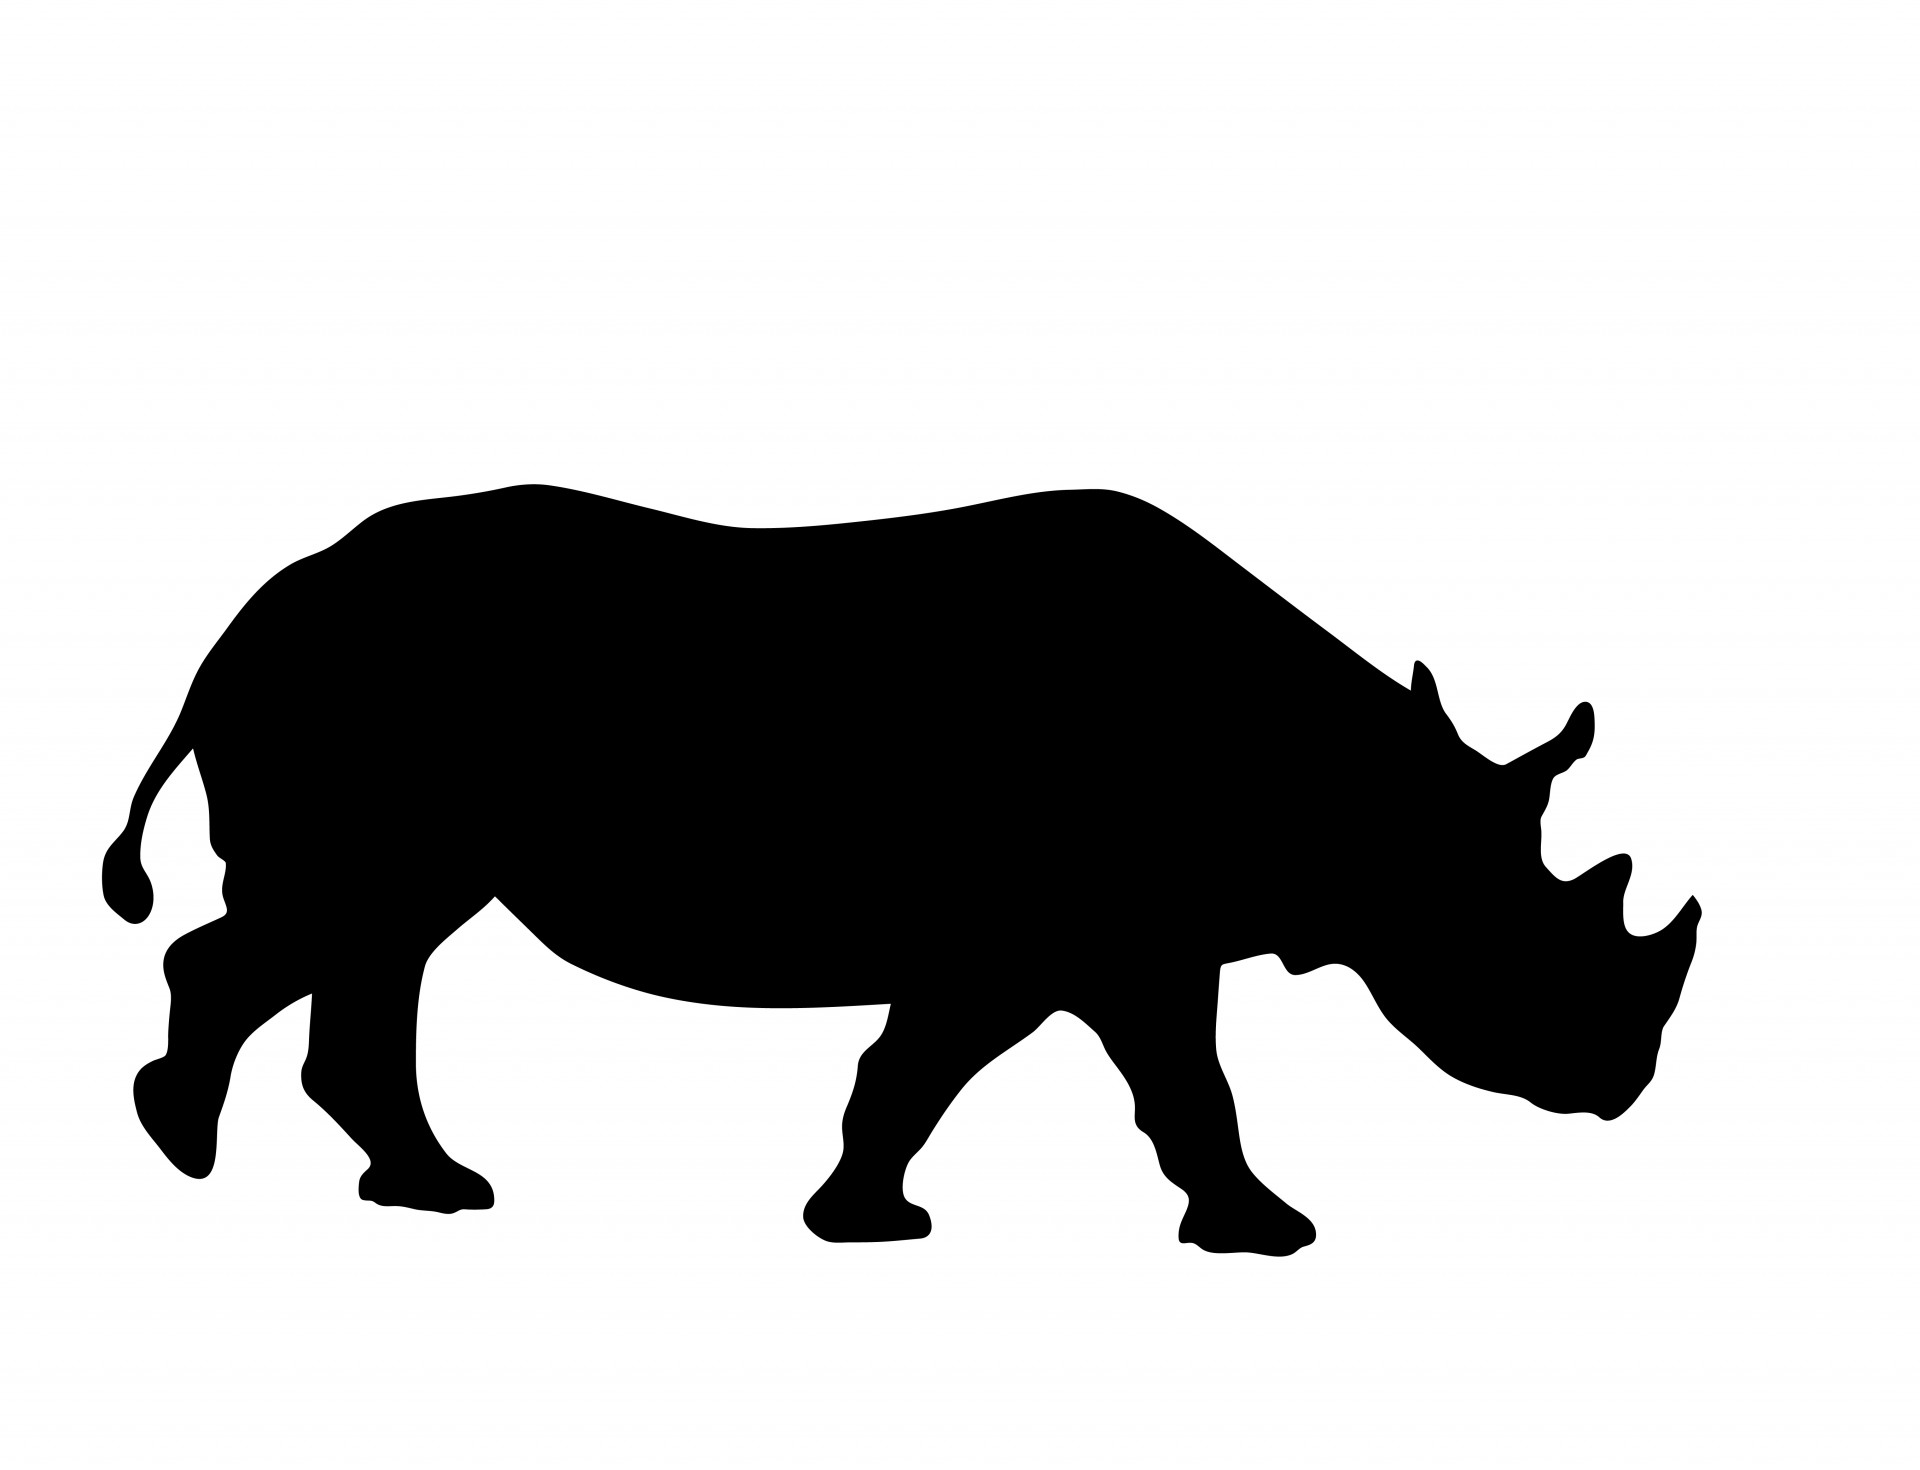 1920x1470 Rhino Silhouette Clipart Free Stock Photo